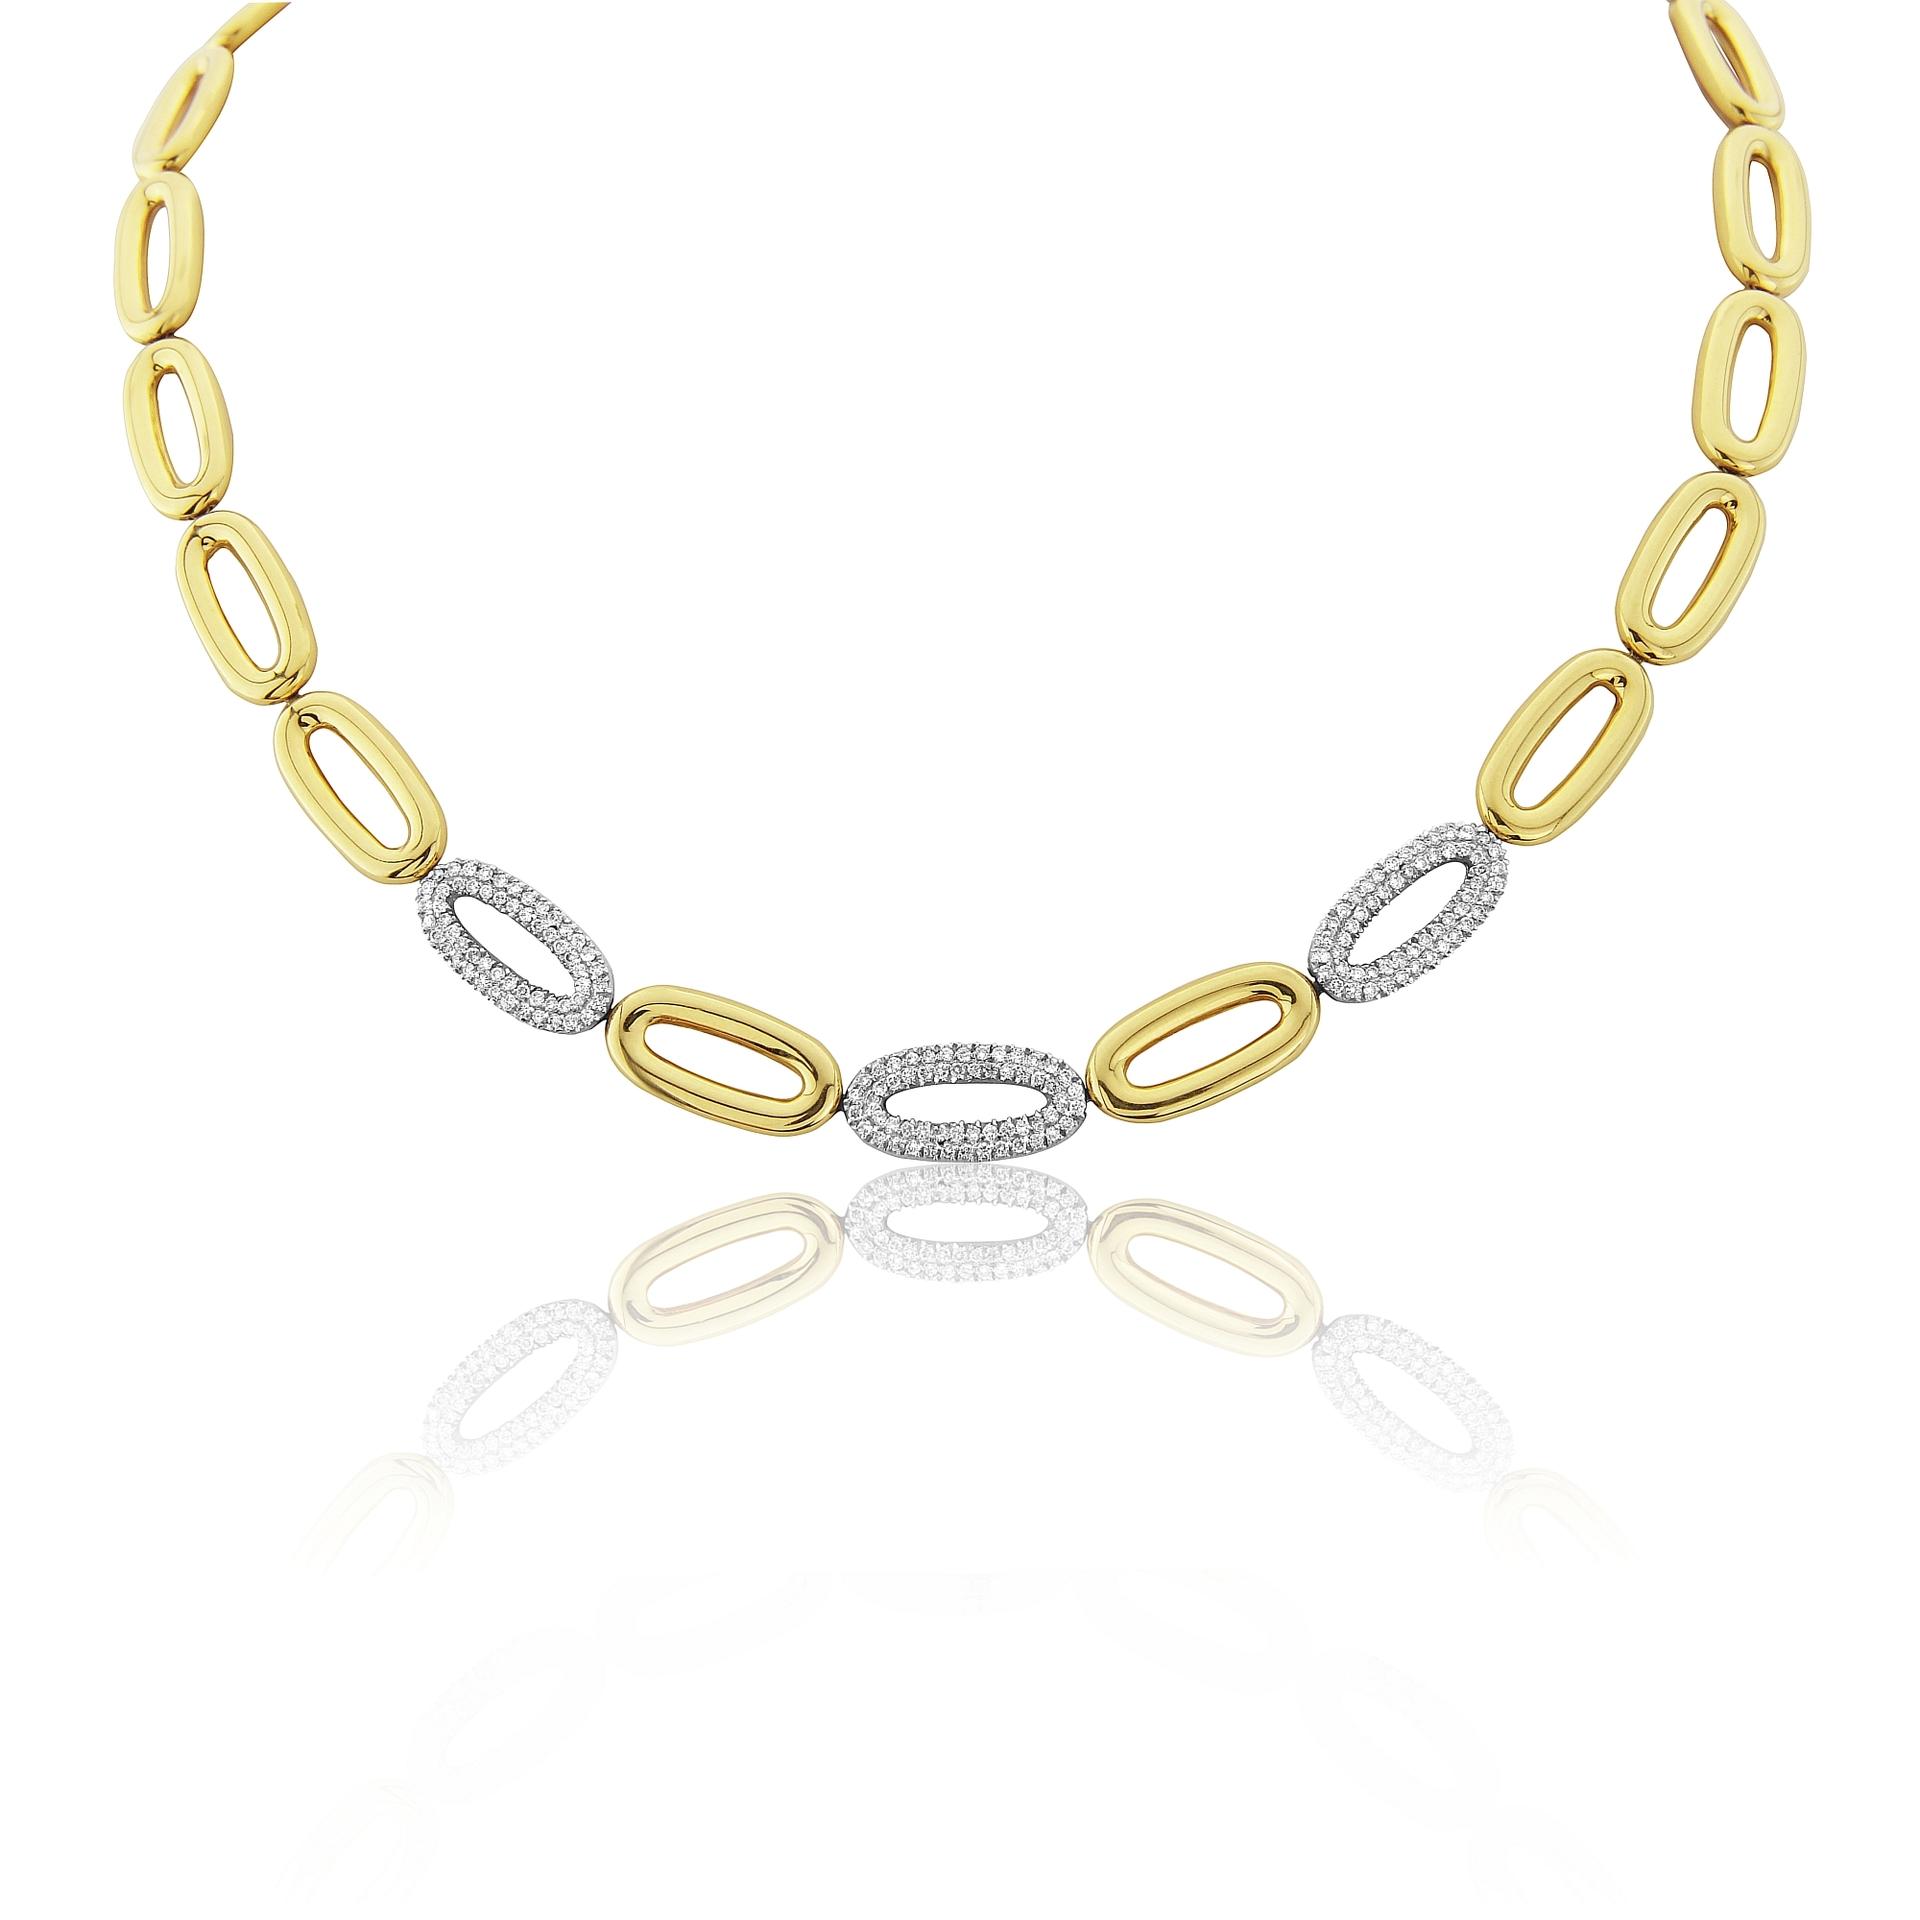 18ct Yellow Gold Oval Diamond Set Loop Necklet